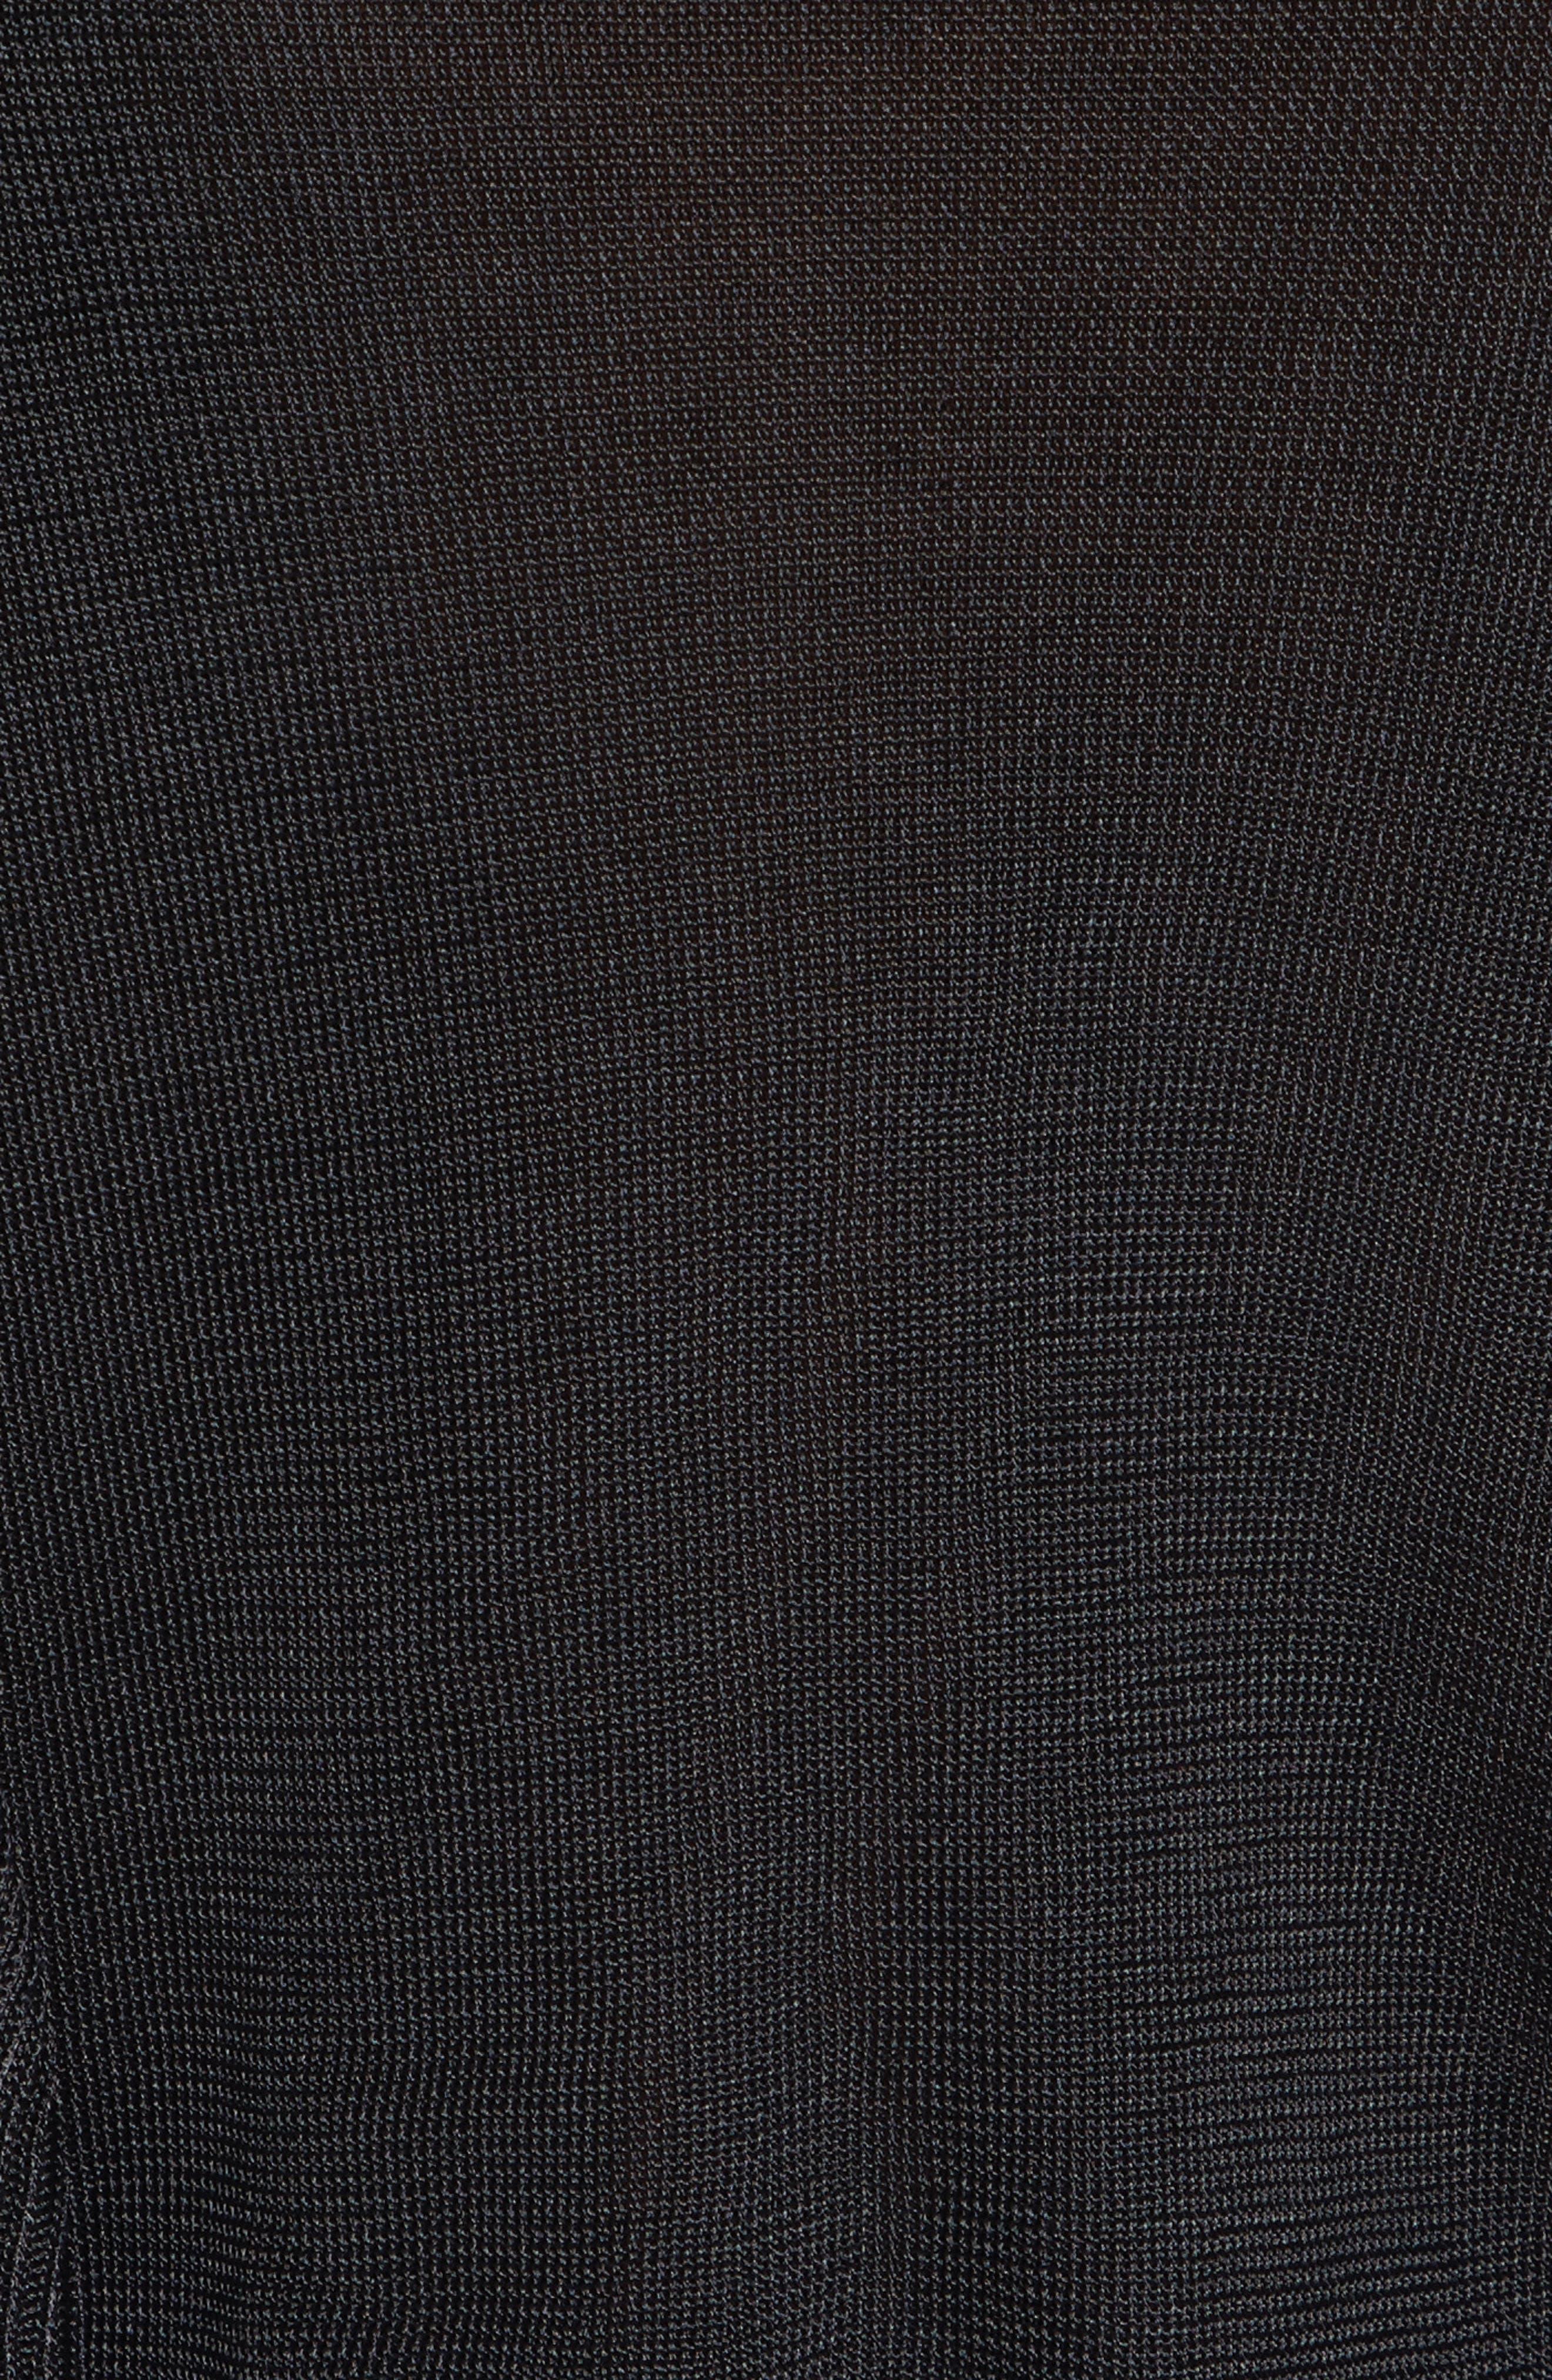 Lou Ruffle Sweater,                             Alternate thumbnail 5, color,                             001